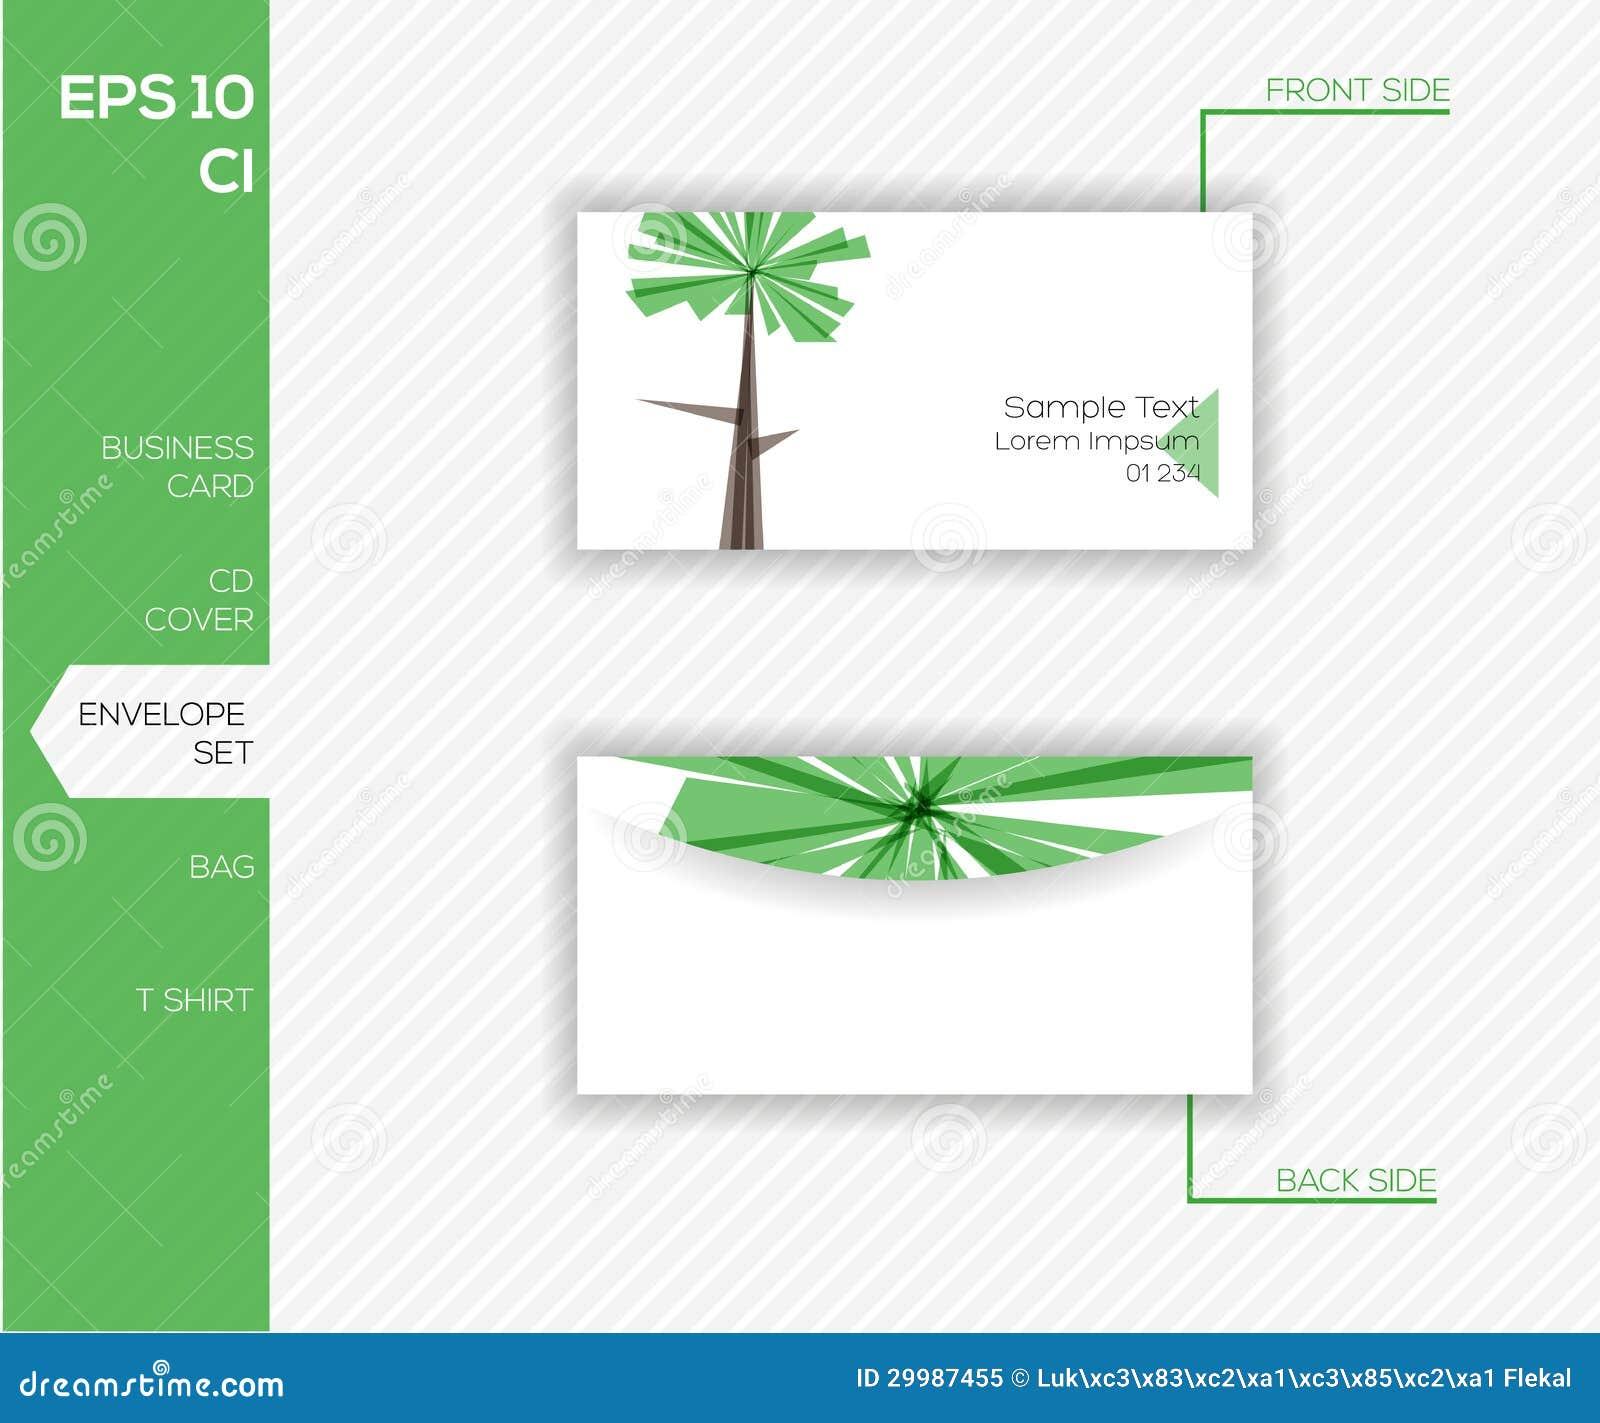 business envelope template - solarfm.tk